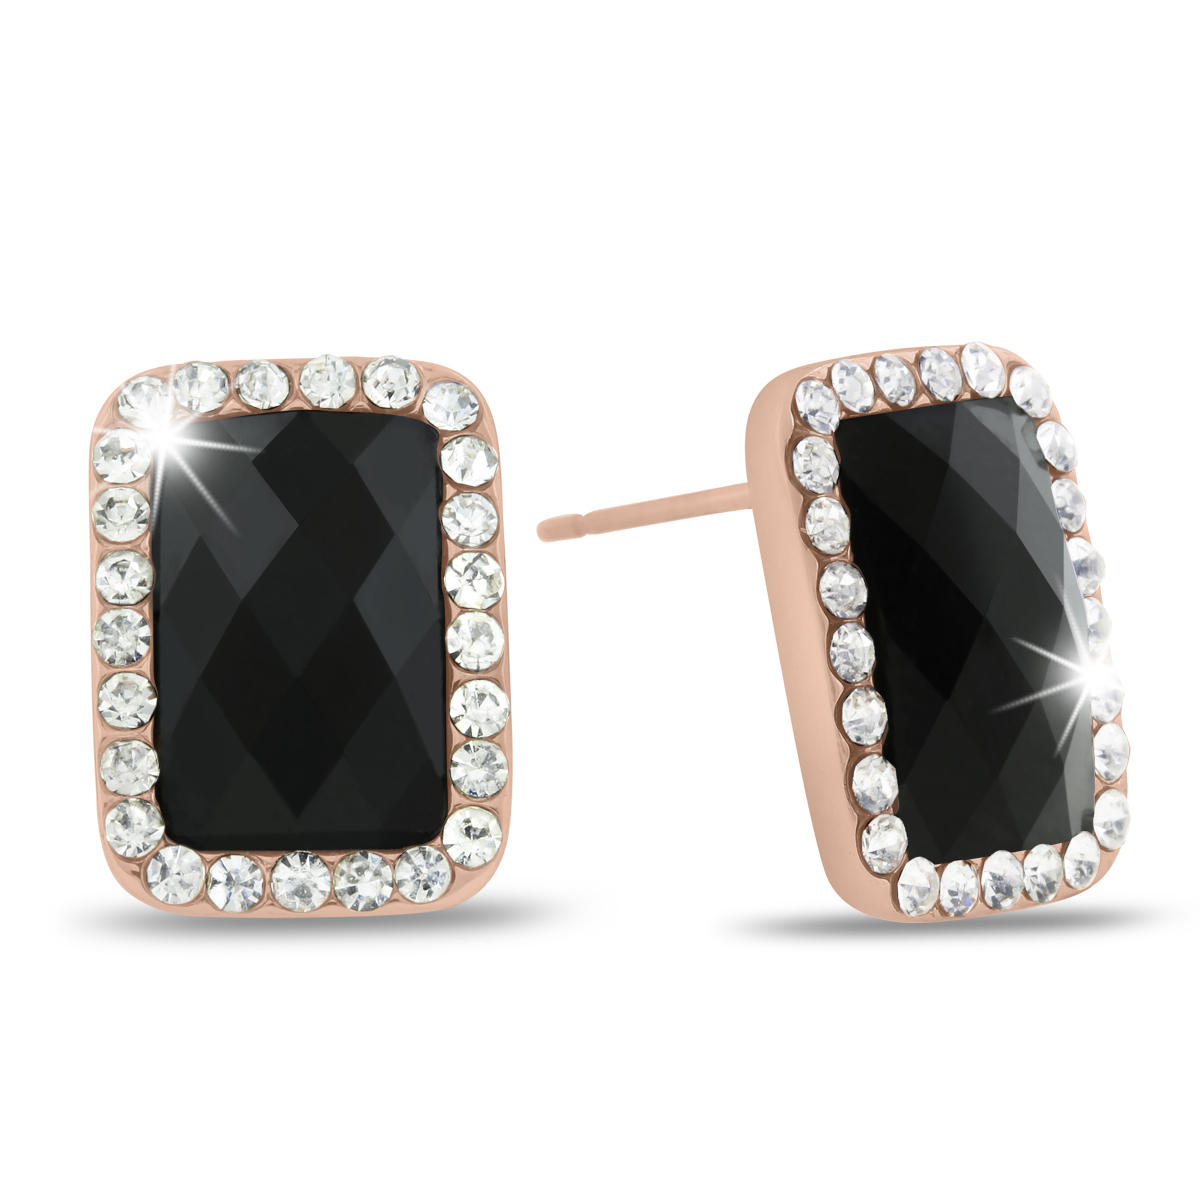 Black Onyx Swarovski Elements Stud Earrings, Pushbacks